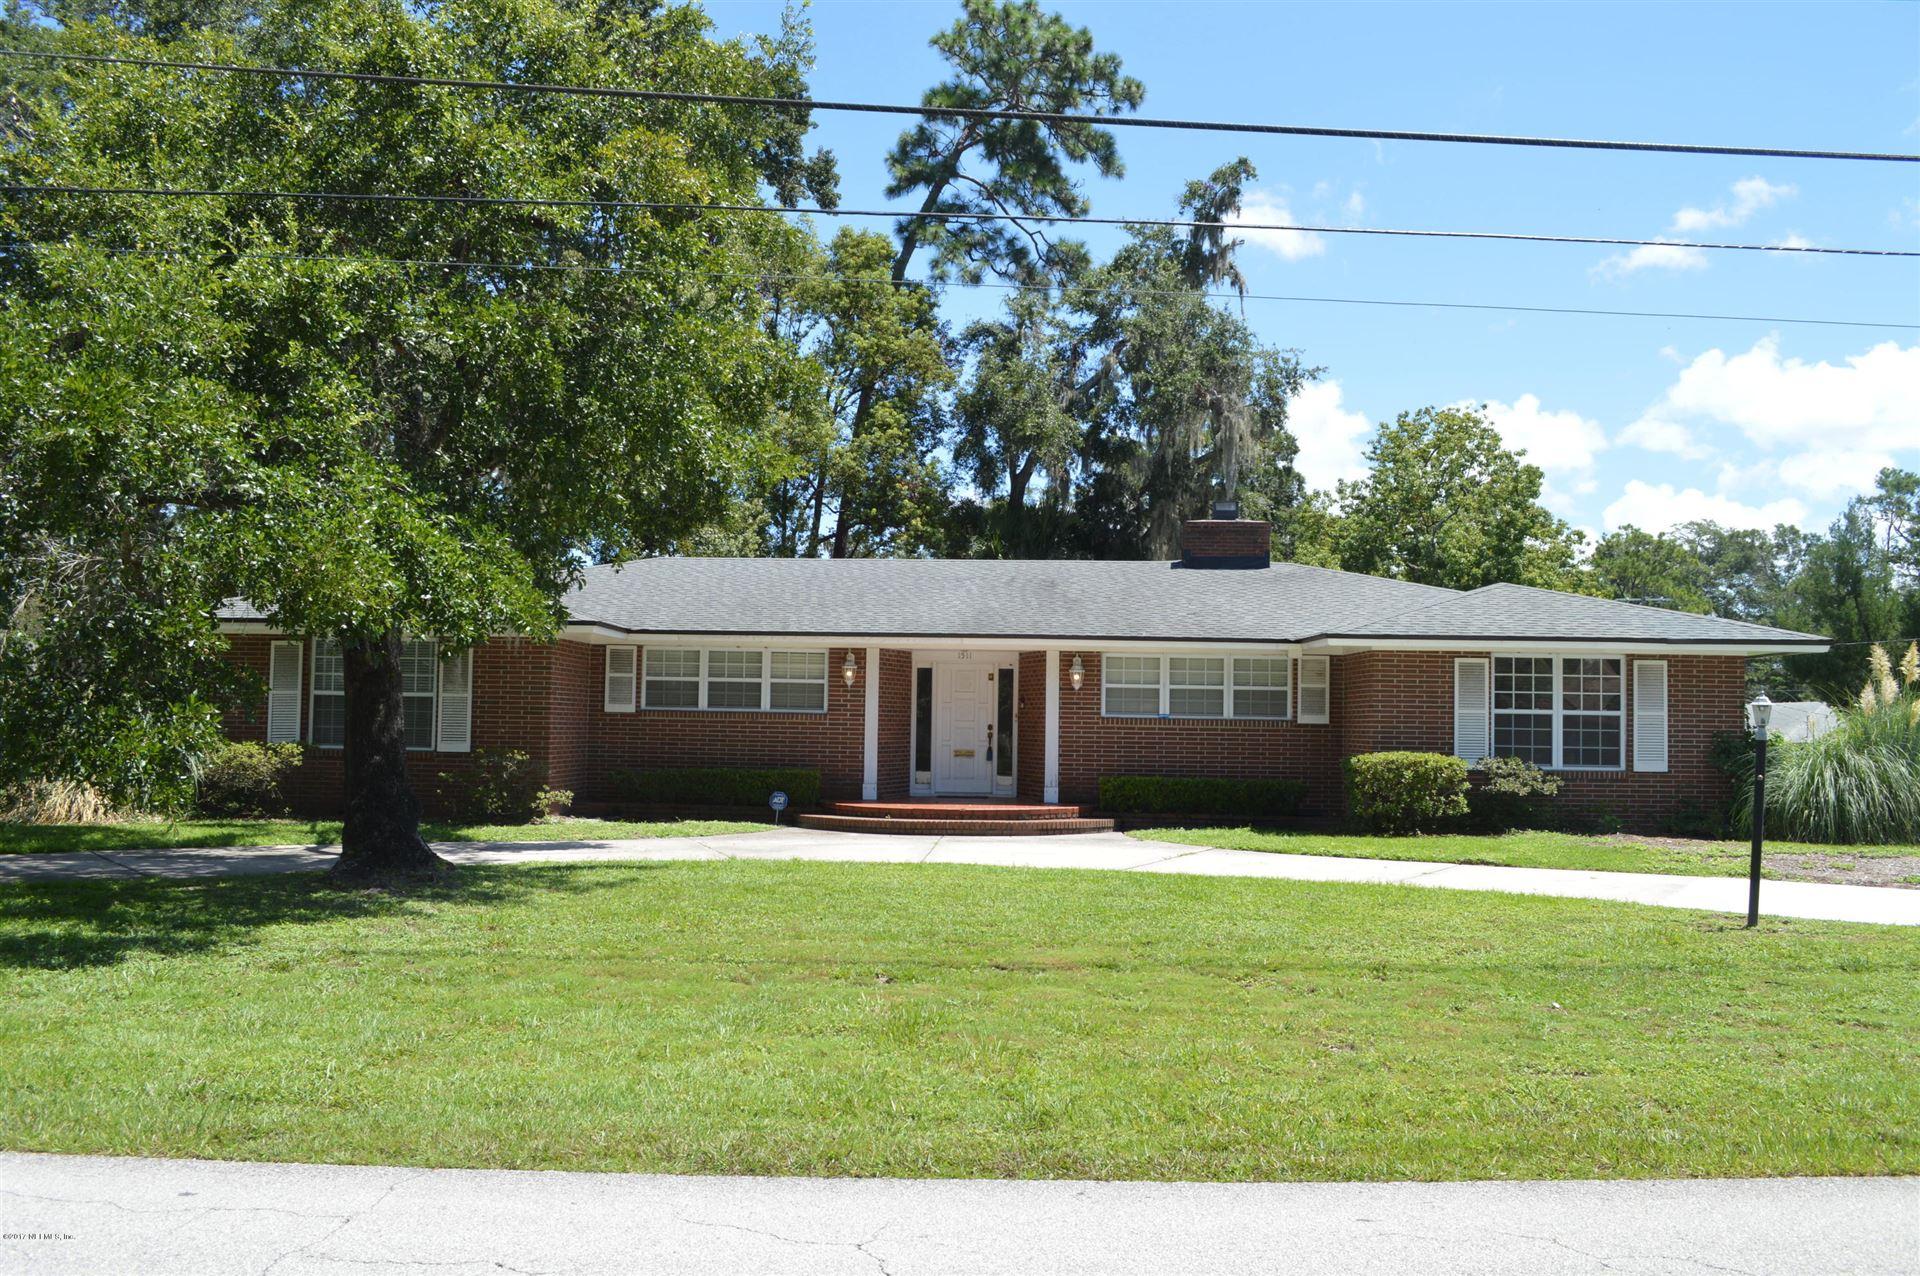 1511 EMPIRE POINT, Jacksonville, FL 32207 - MLS#: 1073183